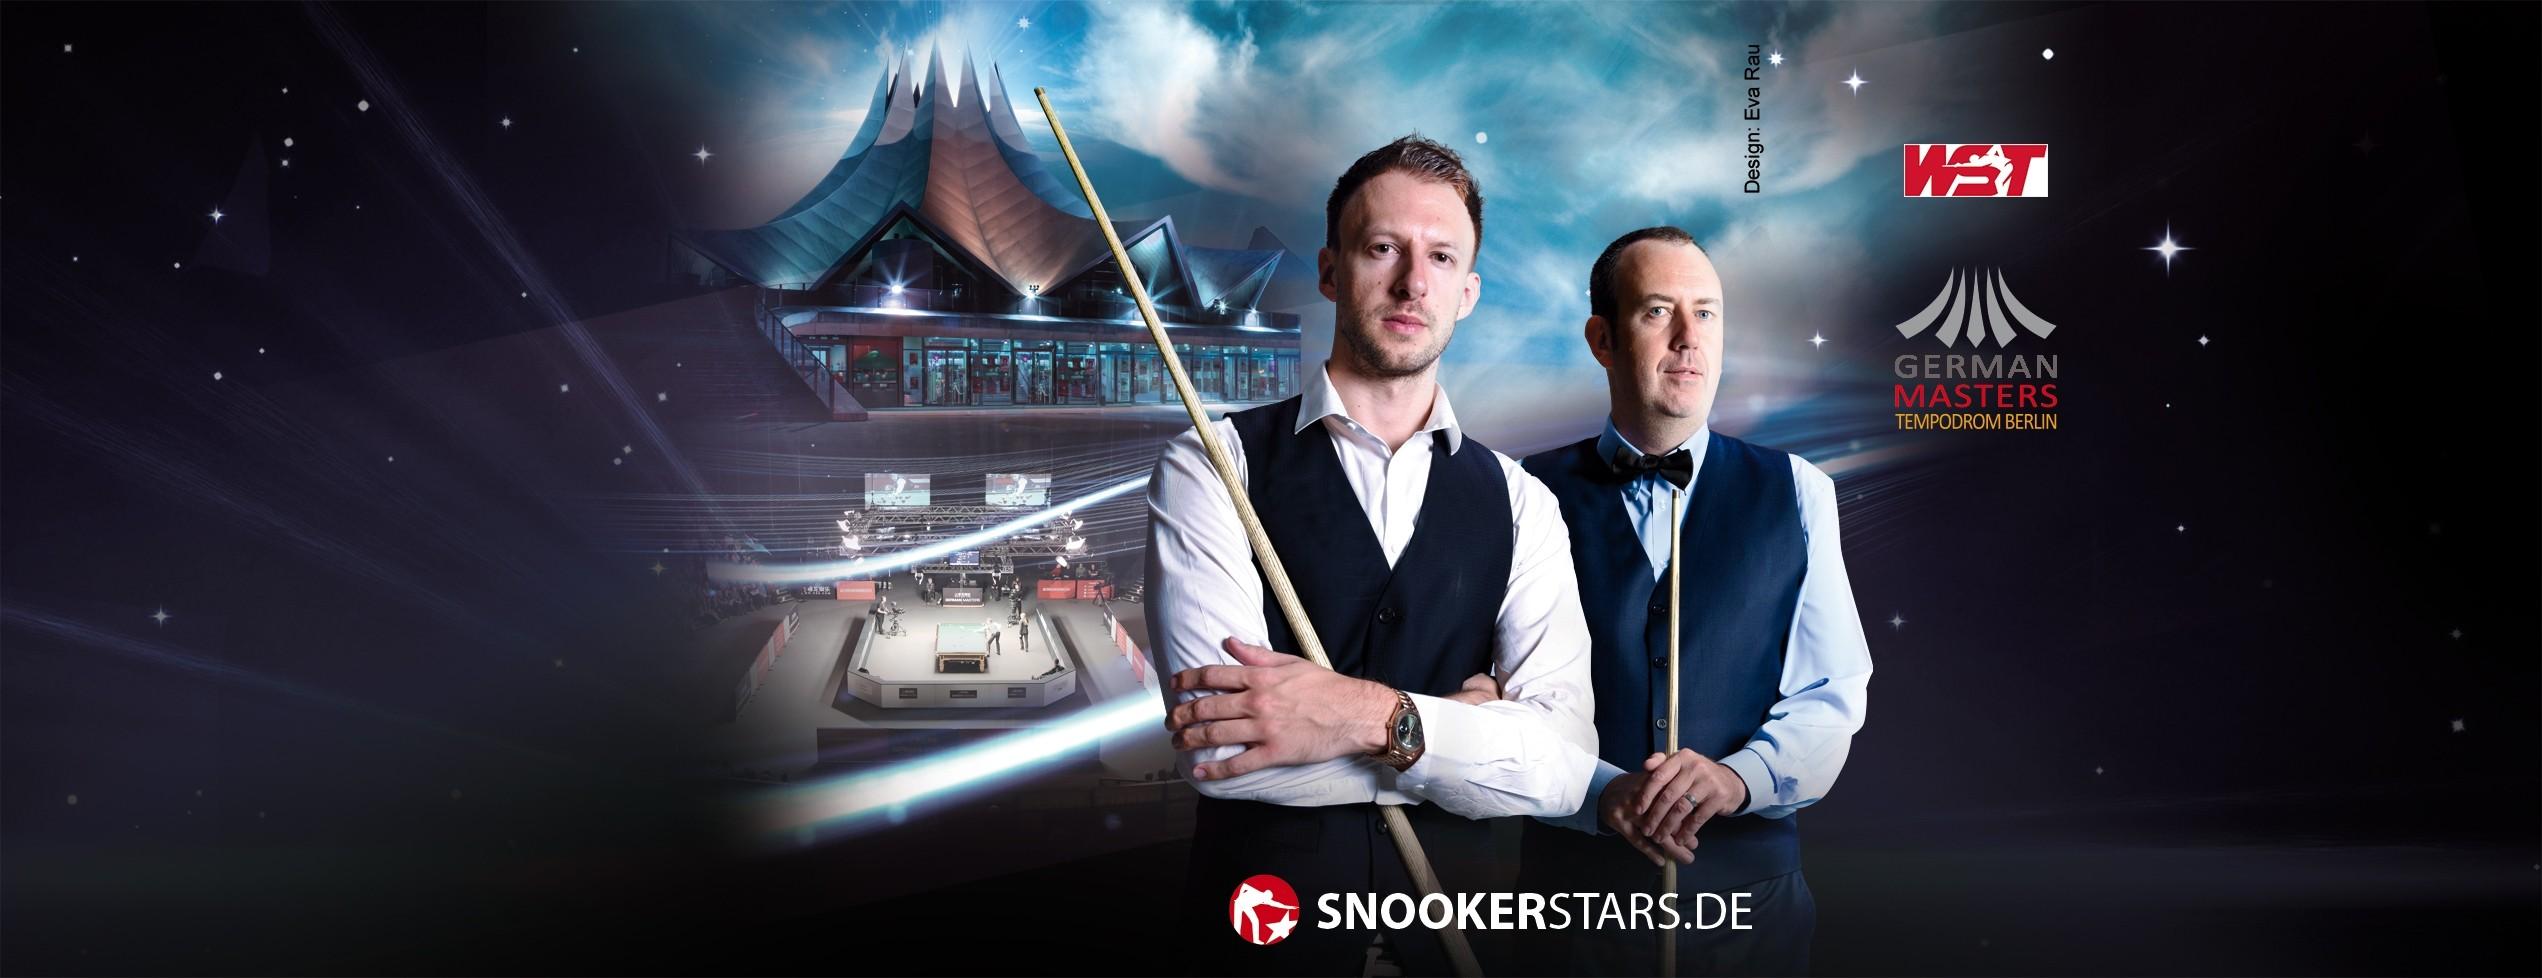 German Masters Berlin 30.01.2021 VIP GOLD